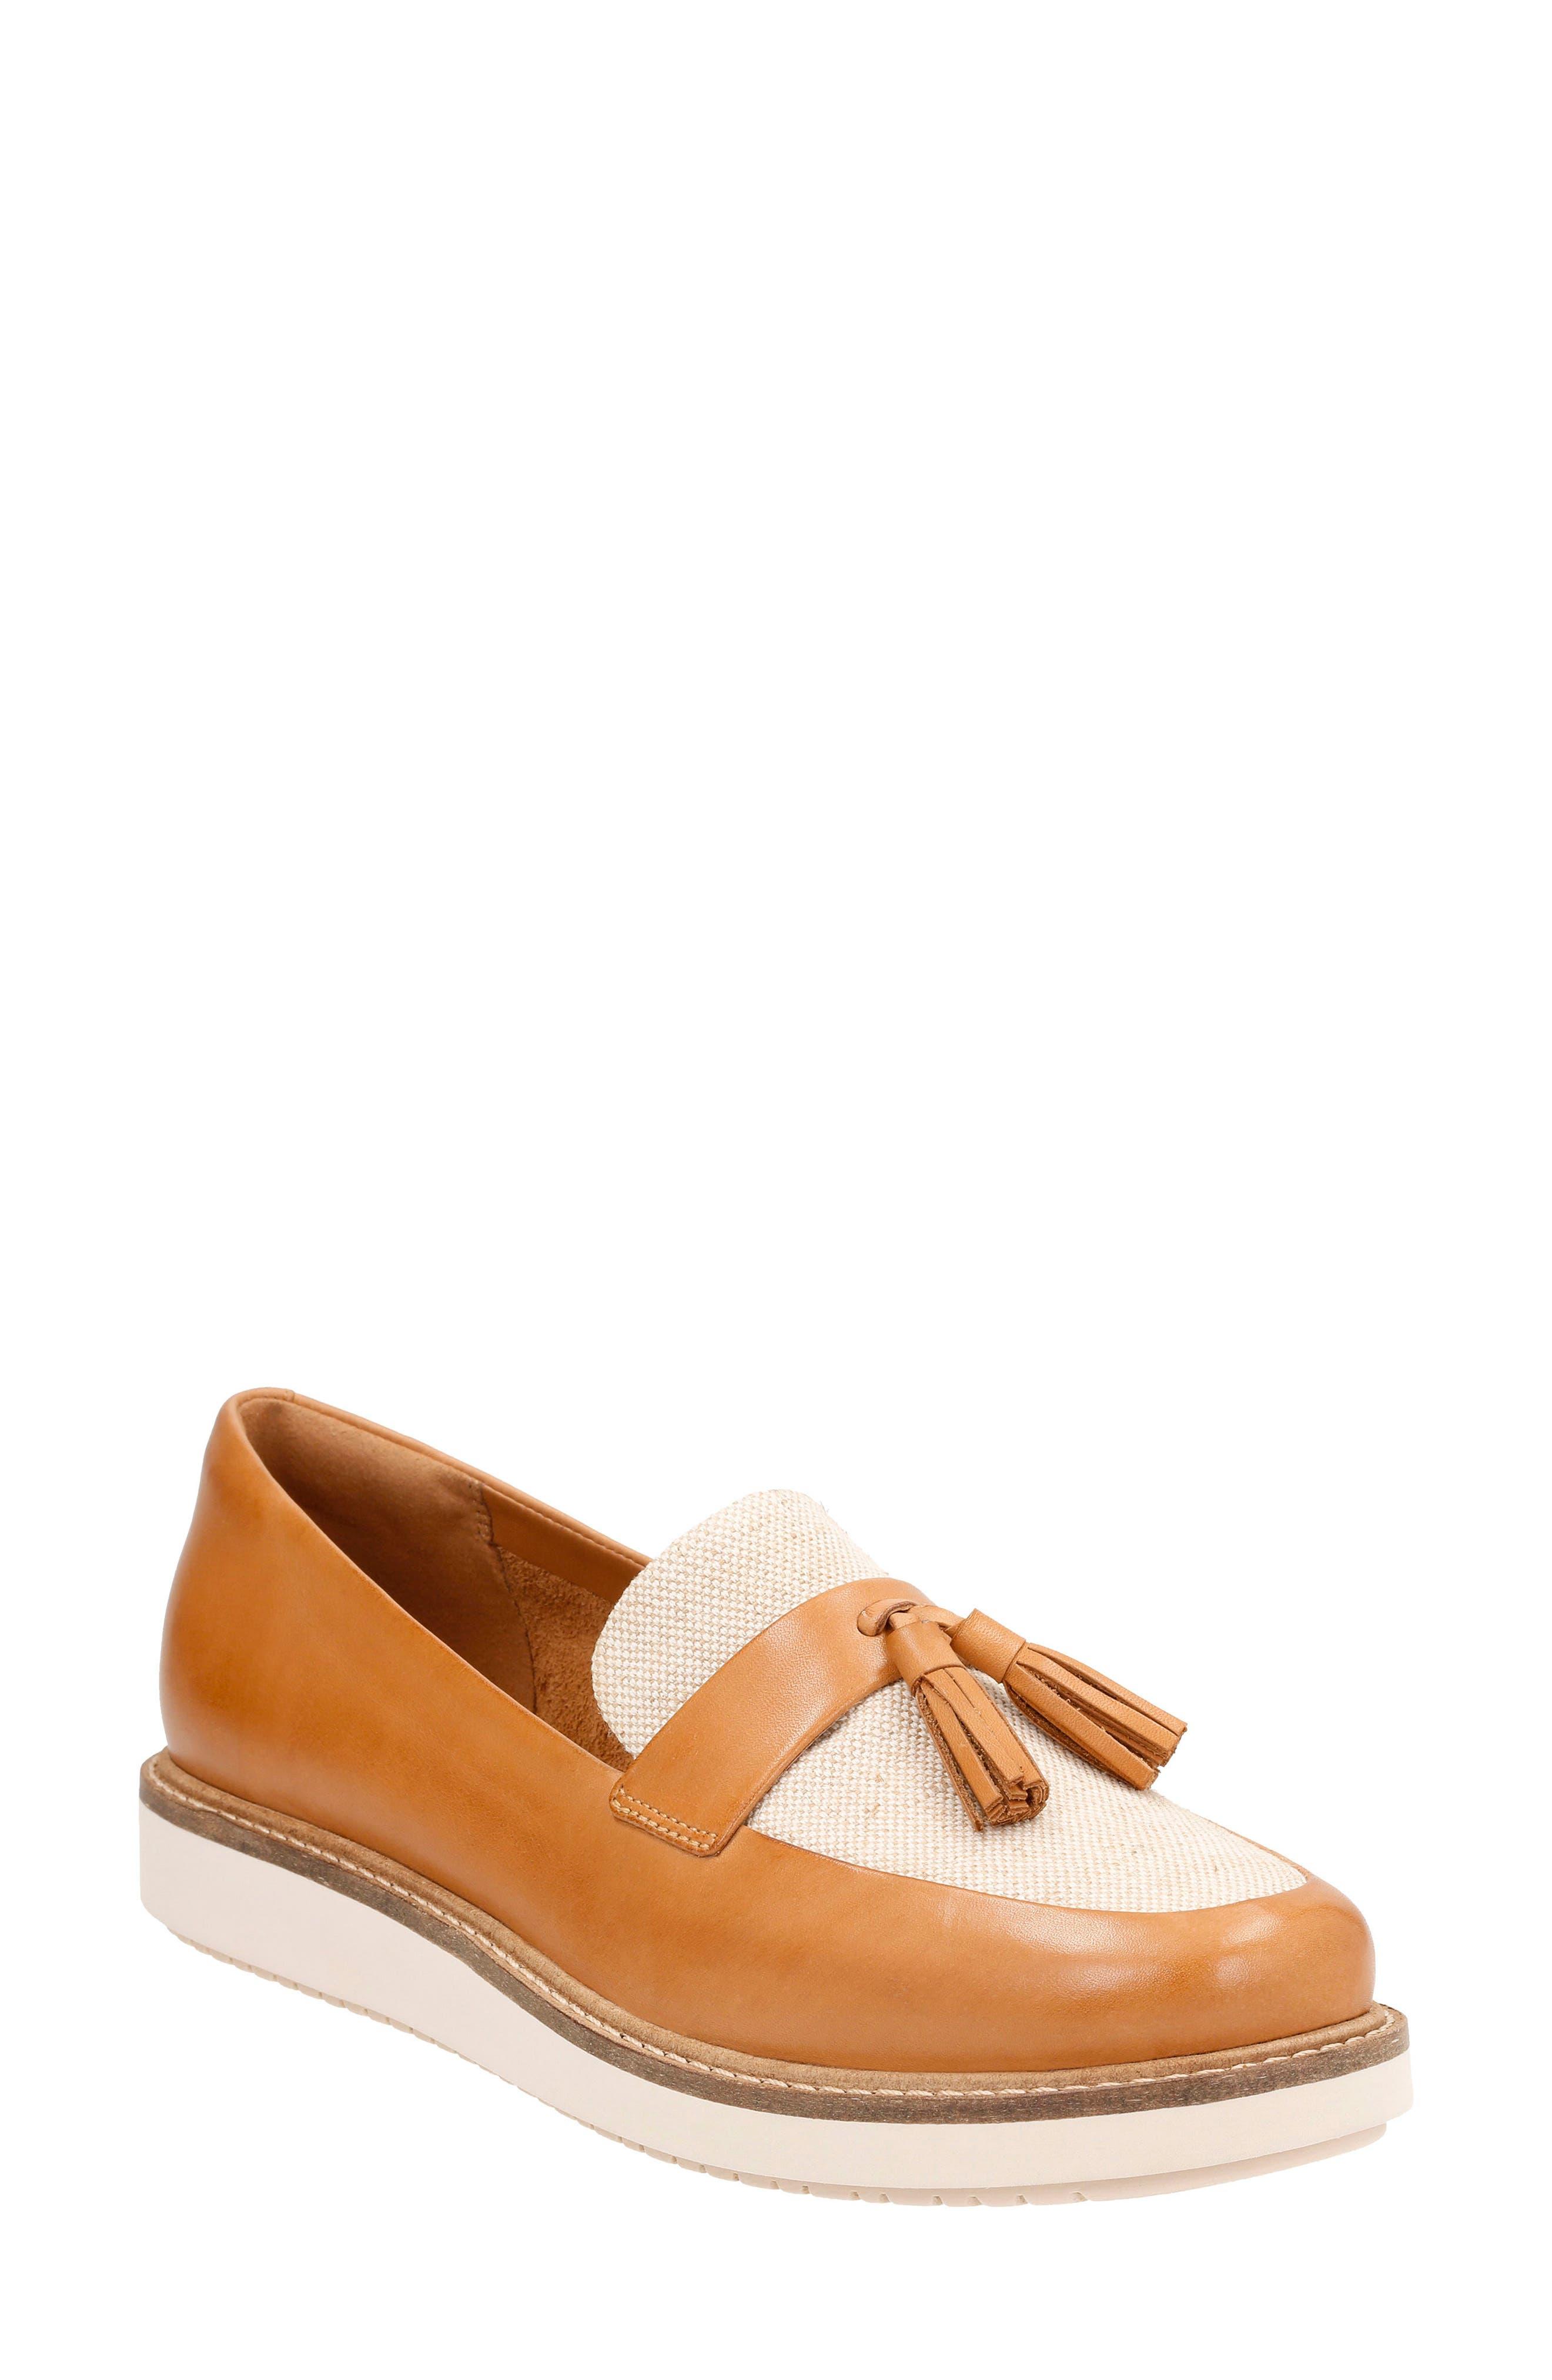 Glick Castine Tassel Loafer,                         Main,                         color,